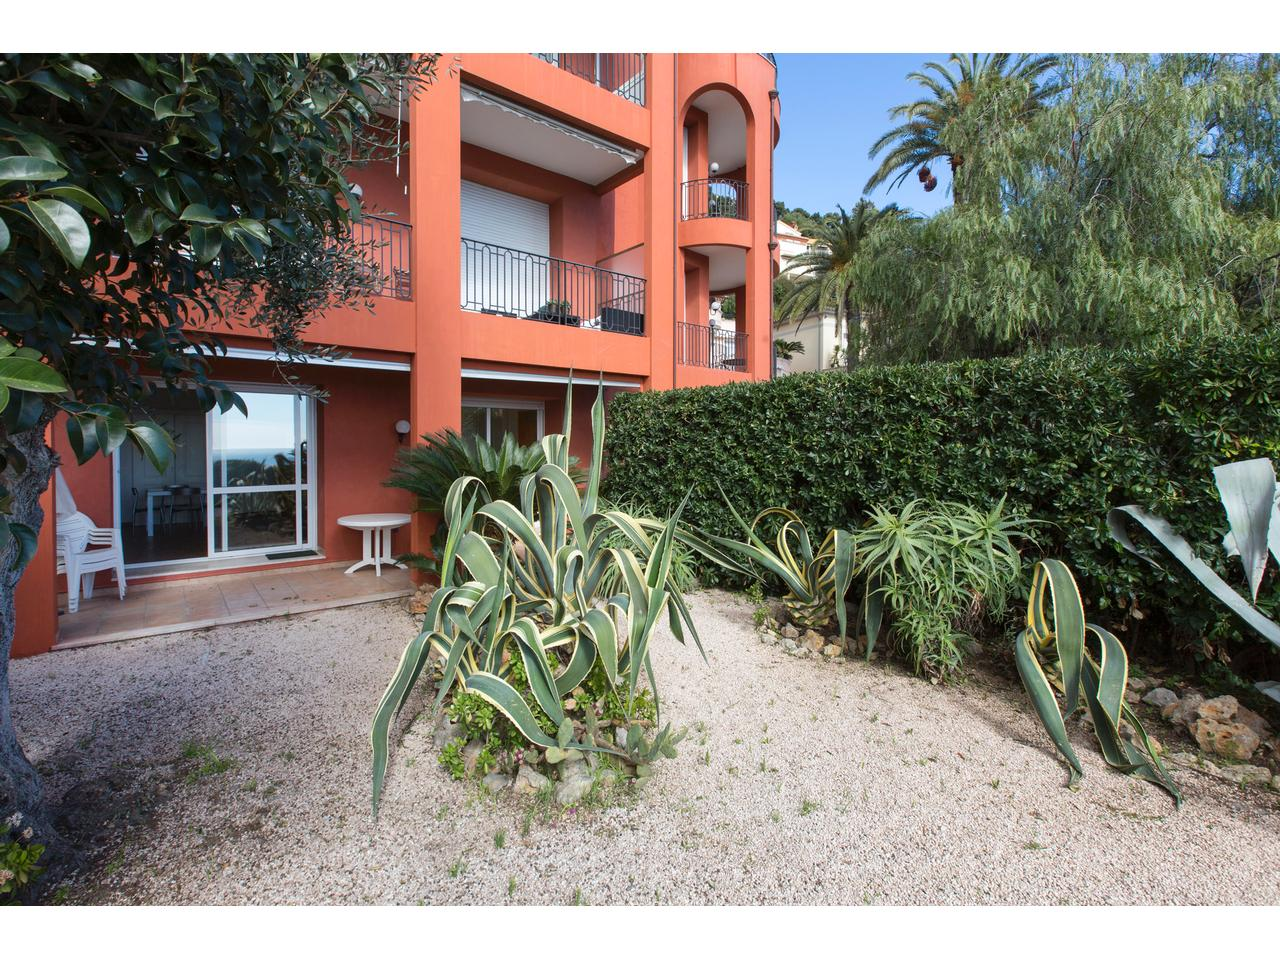 Immobilier nice vue mer appartement villefranche sur mer 3 for Le jardin 3 minutes sur mer